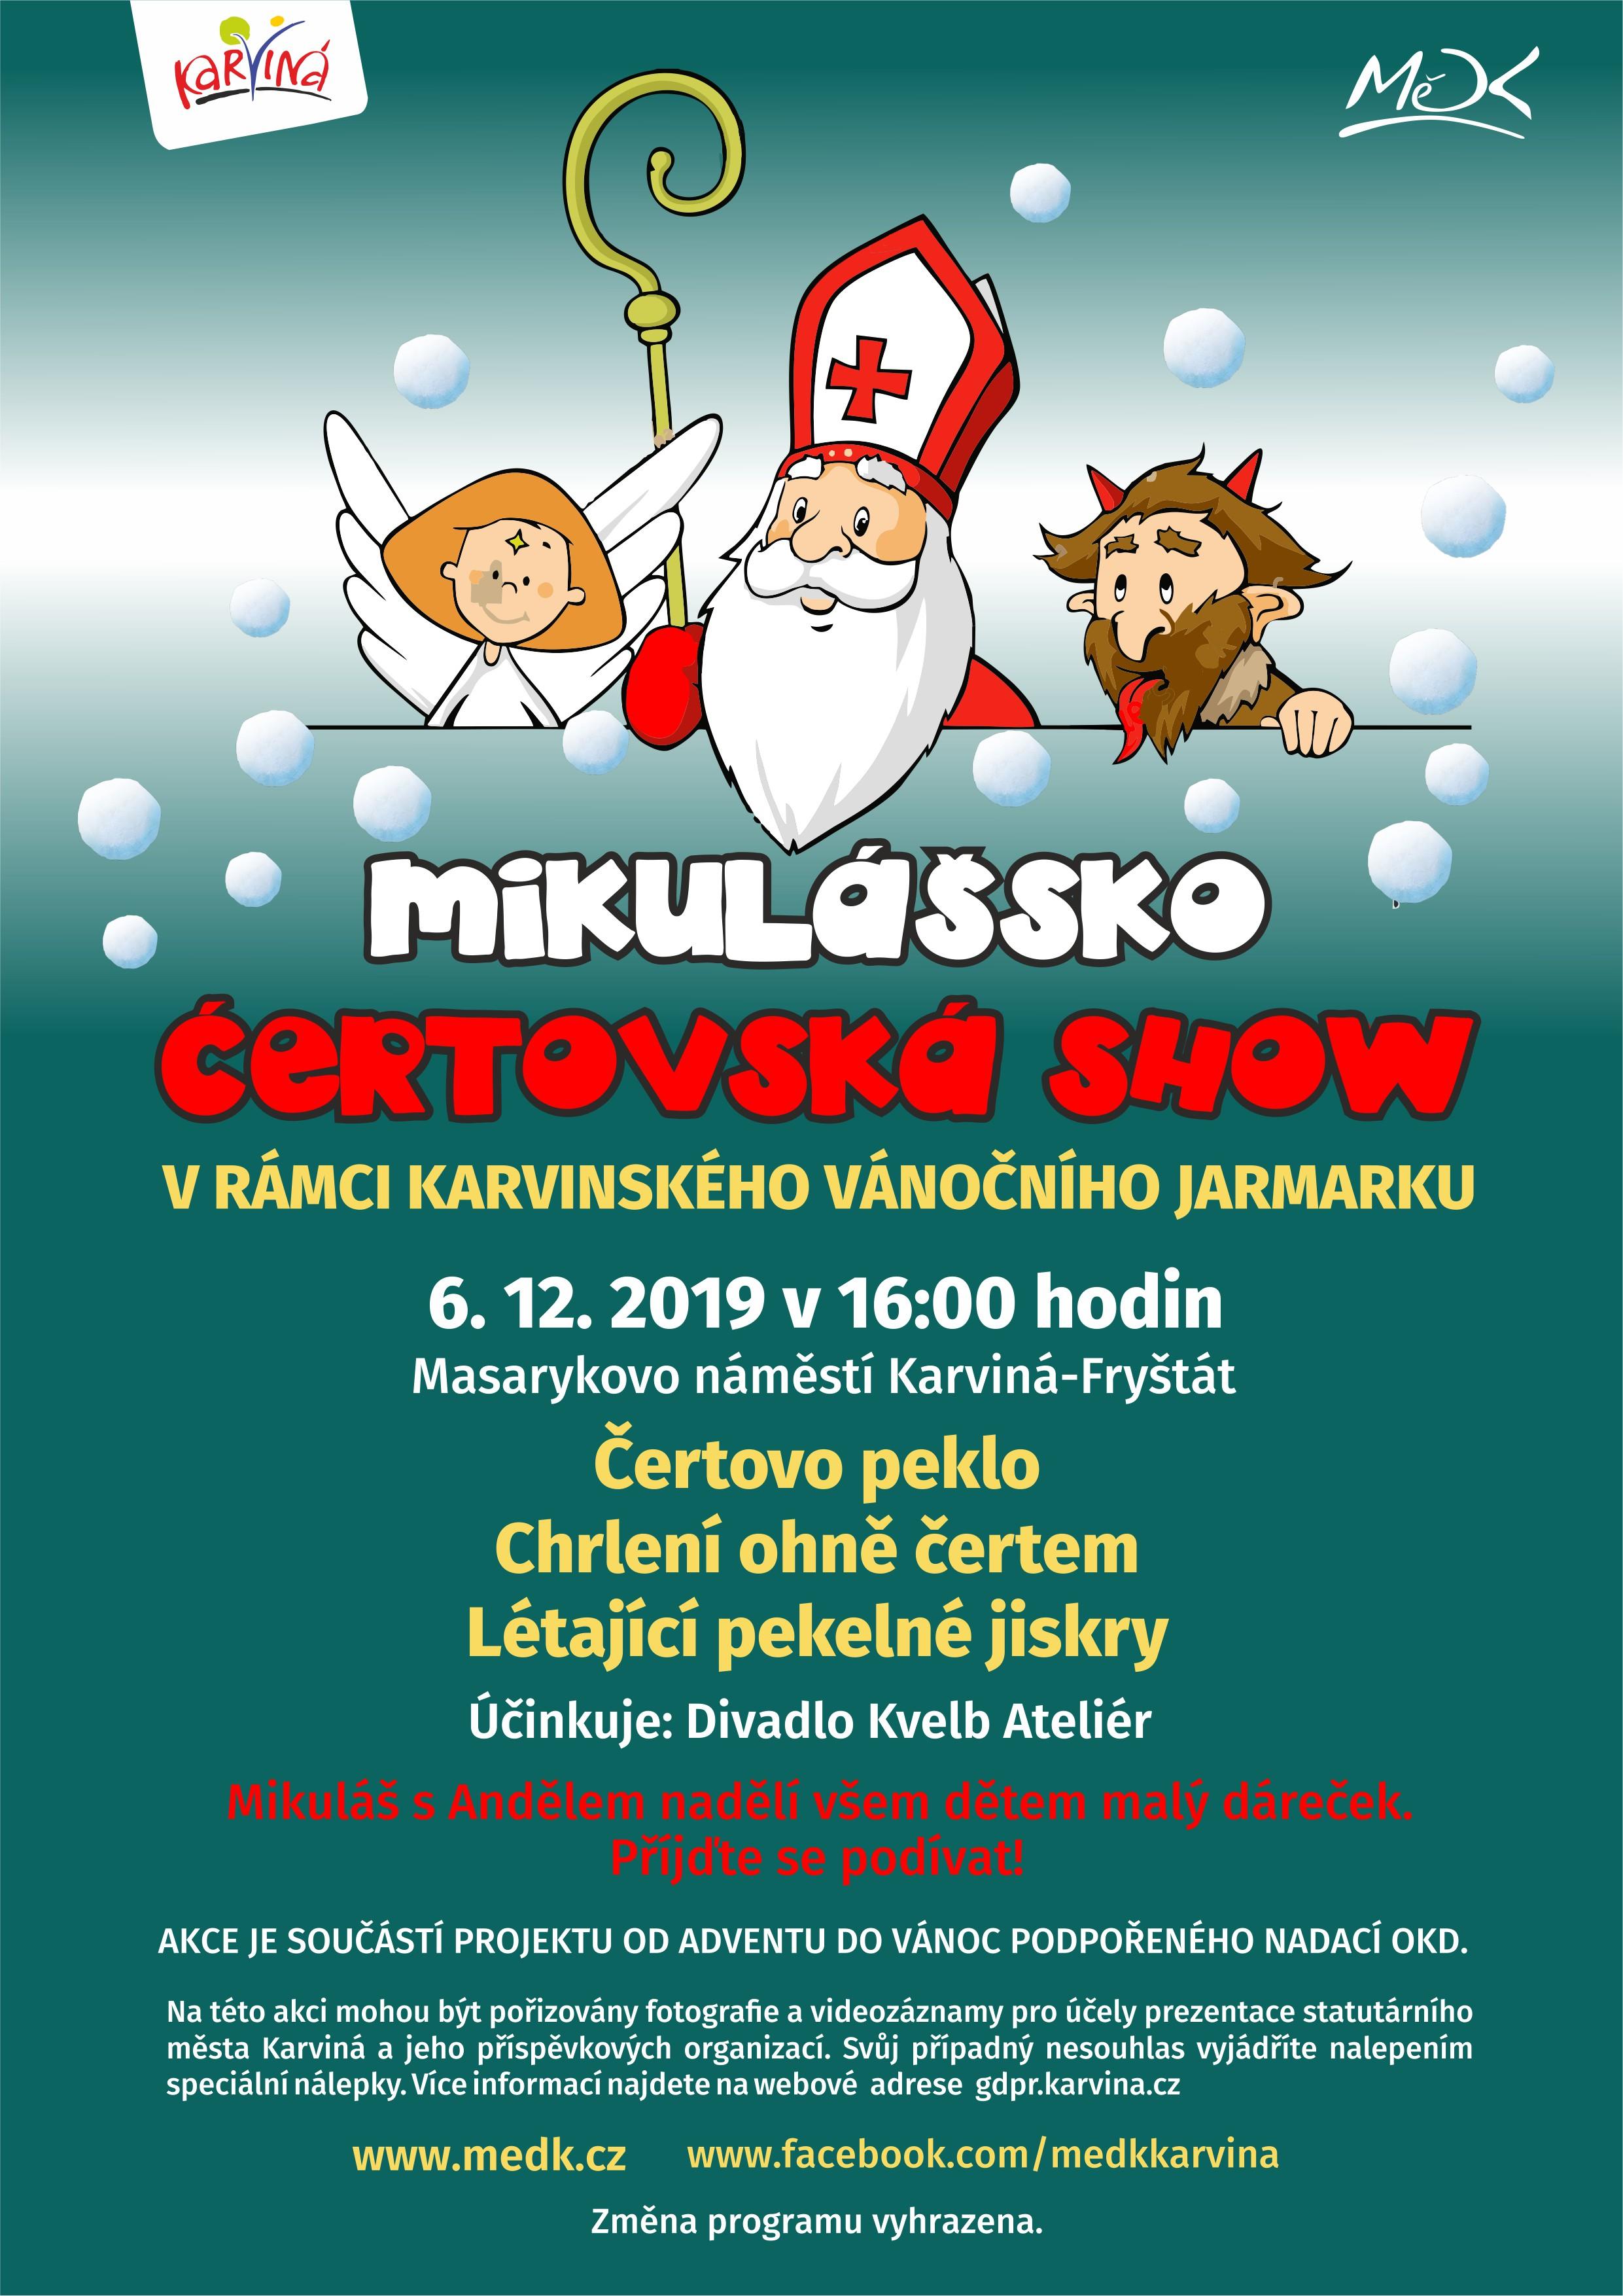 4289-mikulasskocertovska-show.jpg